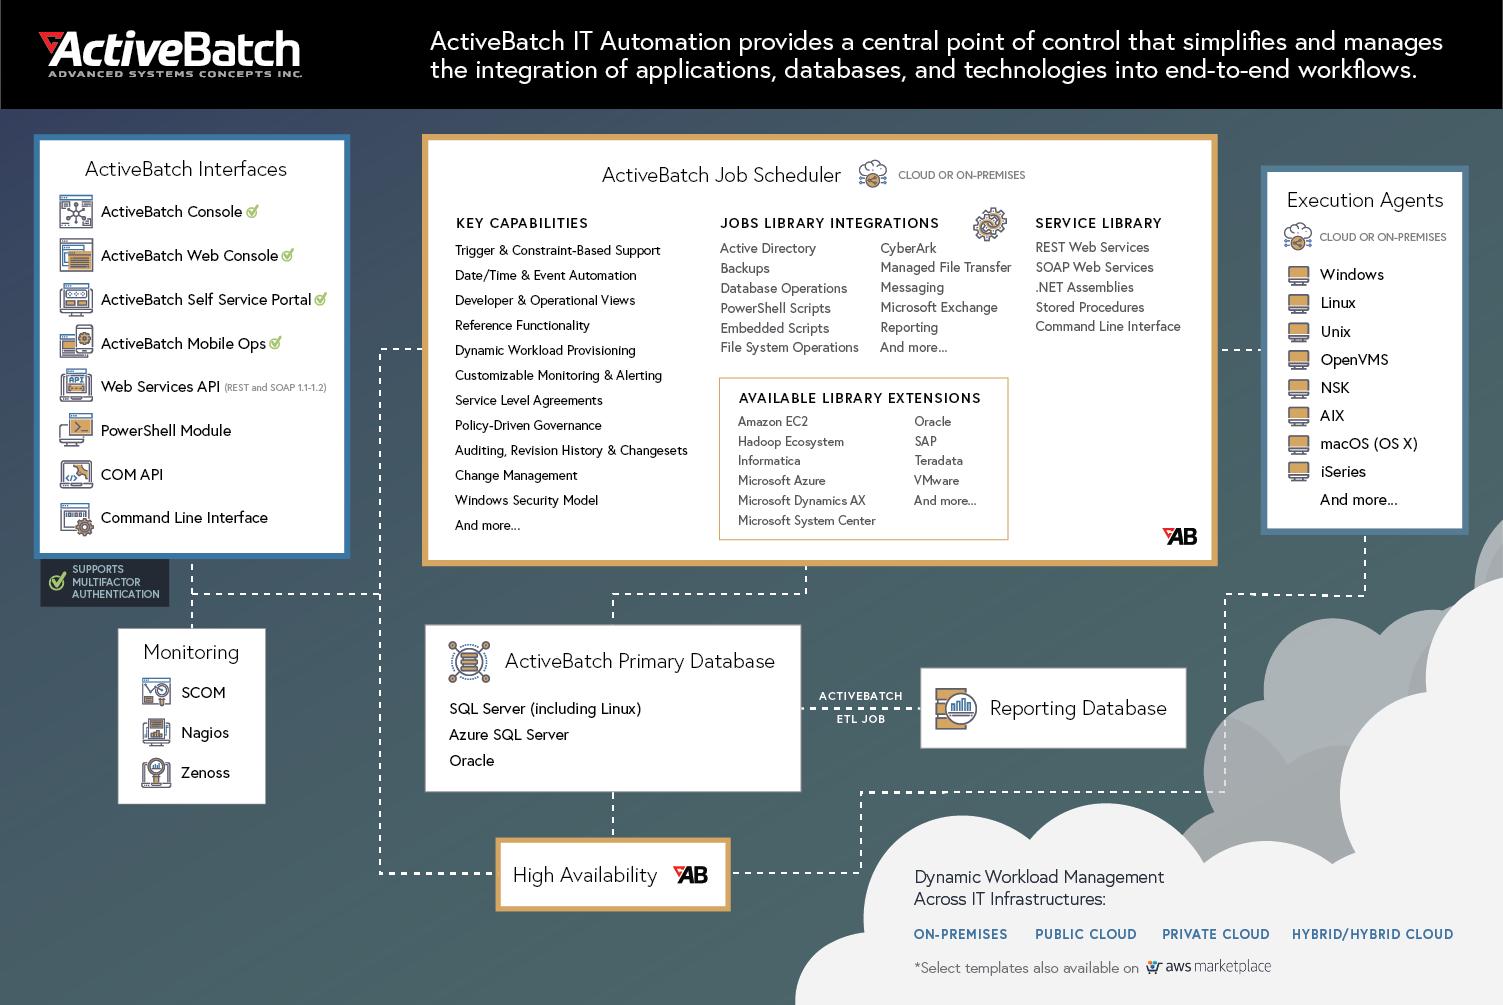 ActiveBatch Architecture Diagram